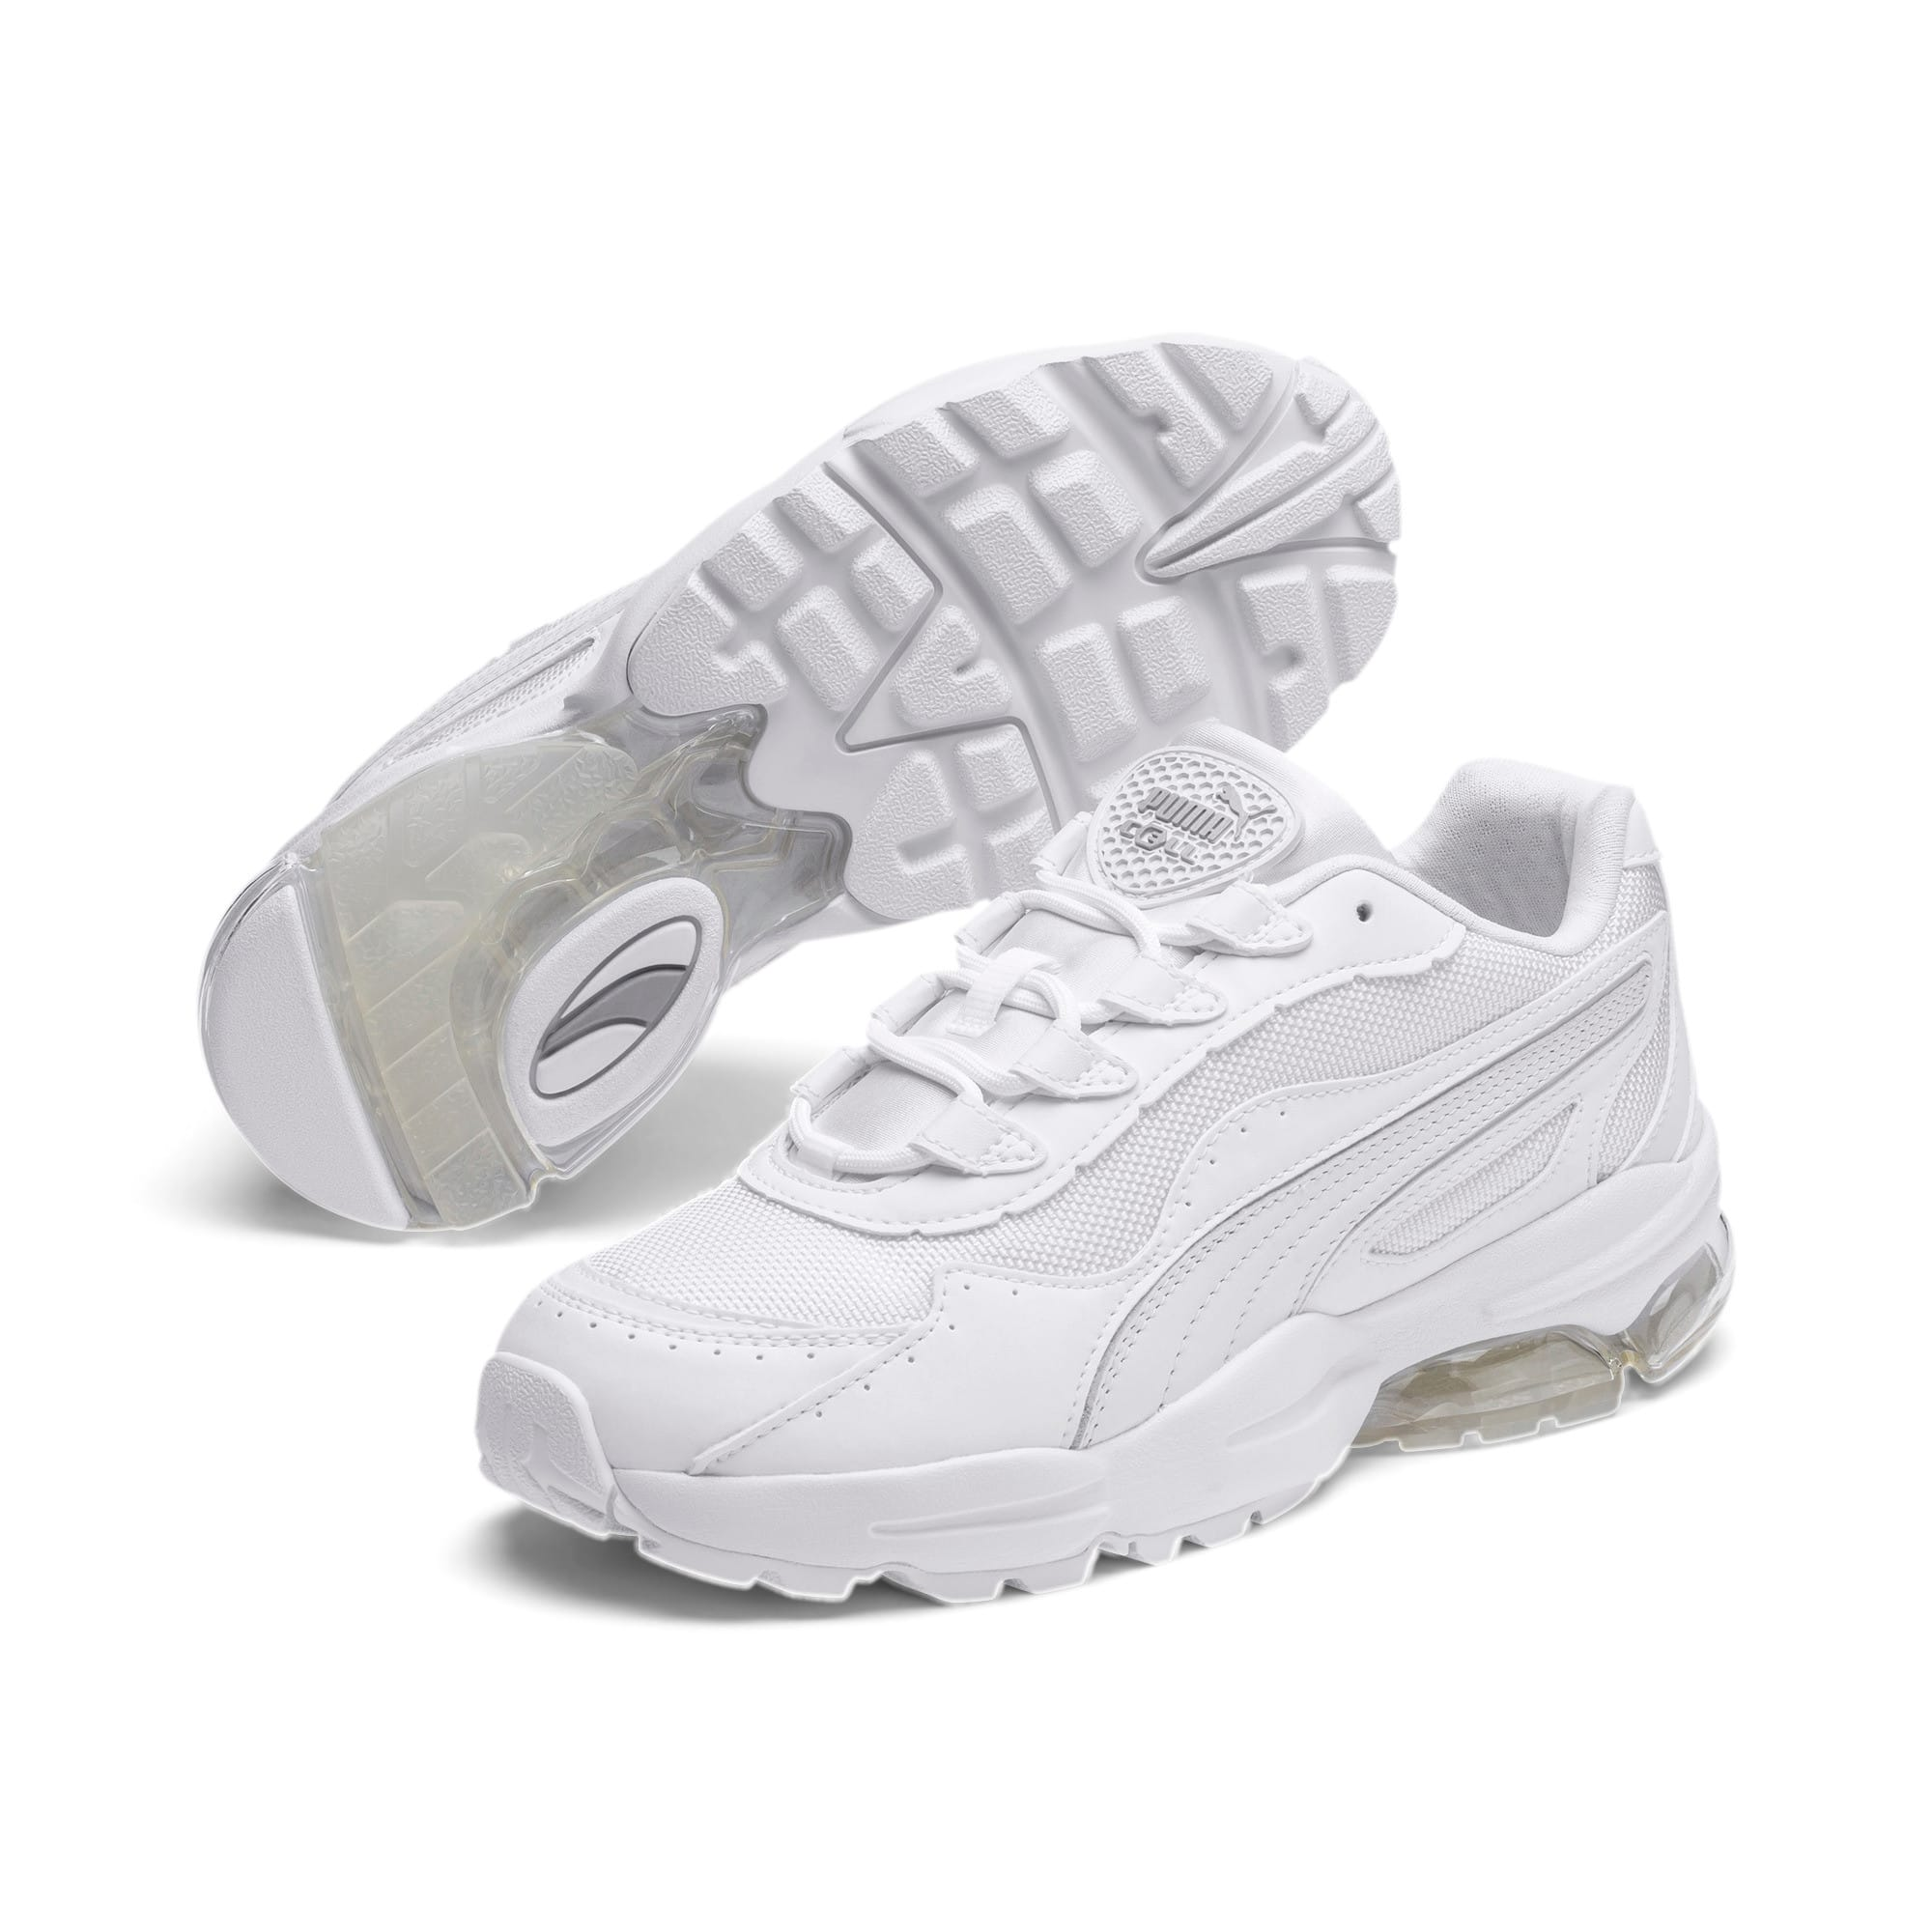 Thumbnail 2 of CELL Stellar Damen Sneaker, Puma White-Silver, medium